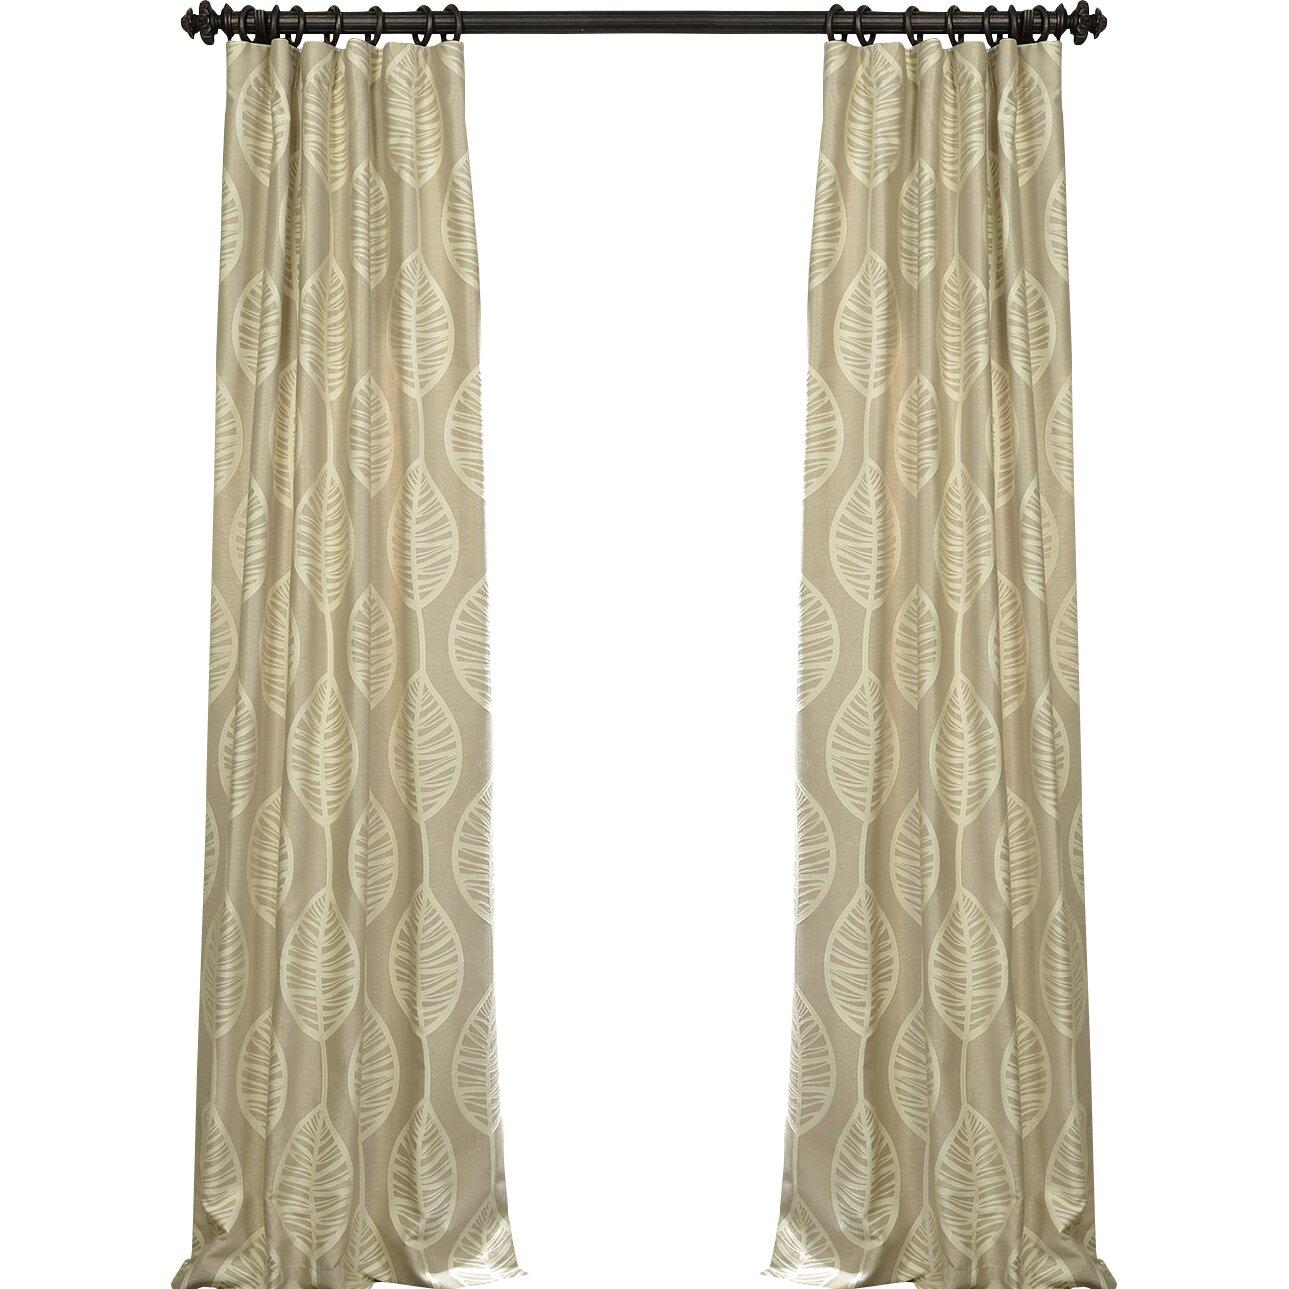 Bay Isle Home Eagle Thermal Single Curtain Panel & Reviews | Wayfair.ca